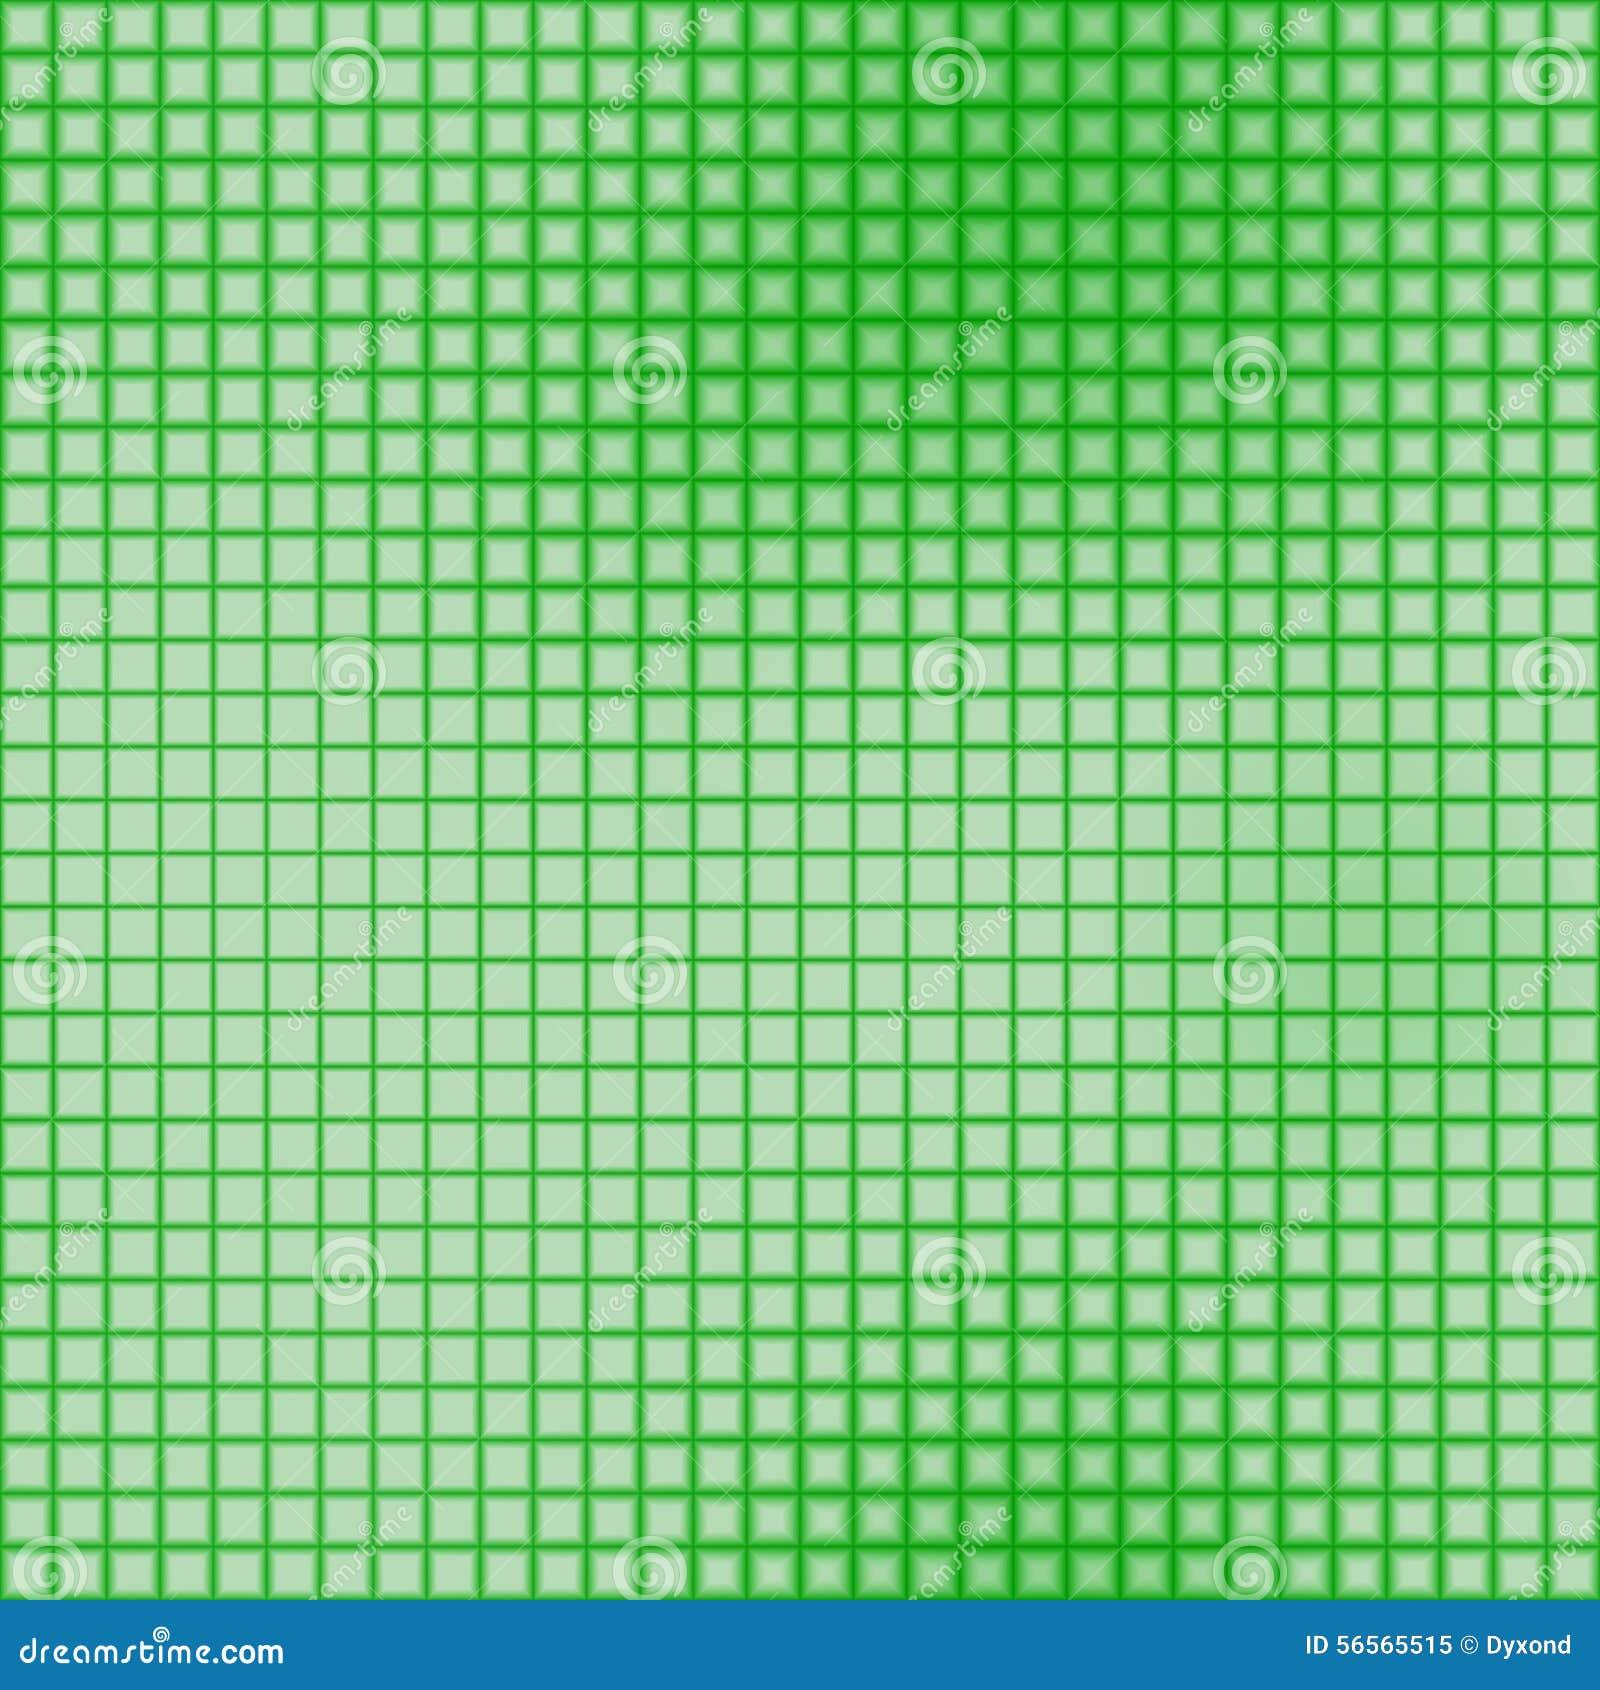 Download αφηρημένο πράσινο κεραμίδι σχοινί απεικόνισης άνευ ρ&a Απεικόνιση αποθεμάτων - εικονογραφία από συμμετρία, backfill: 56565515